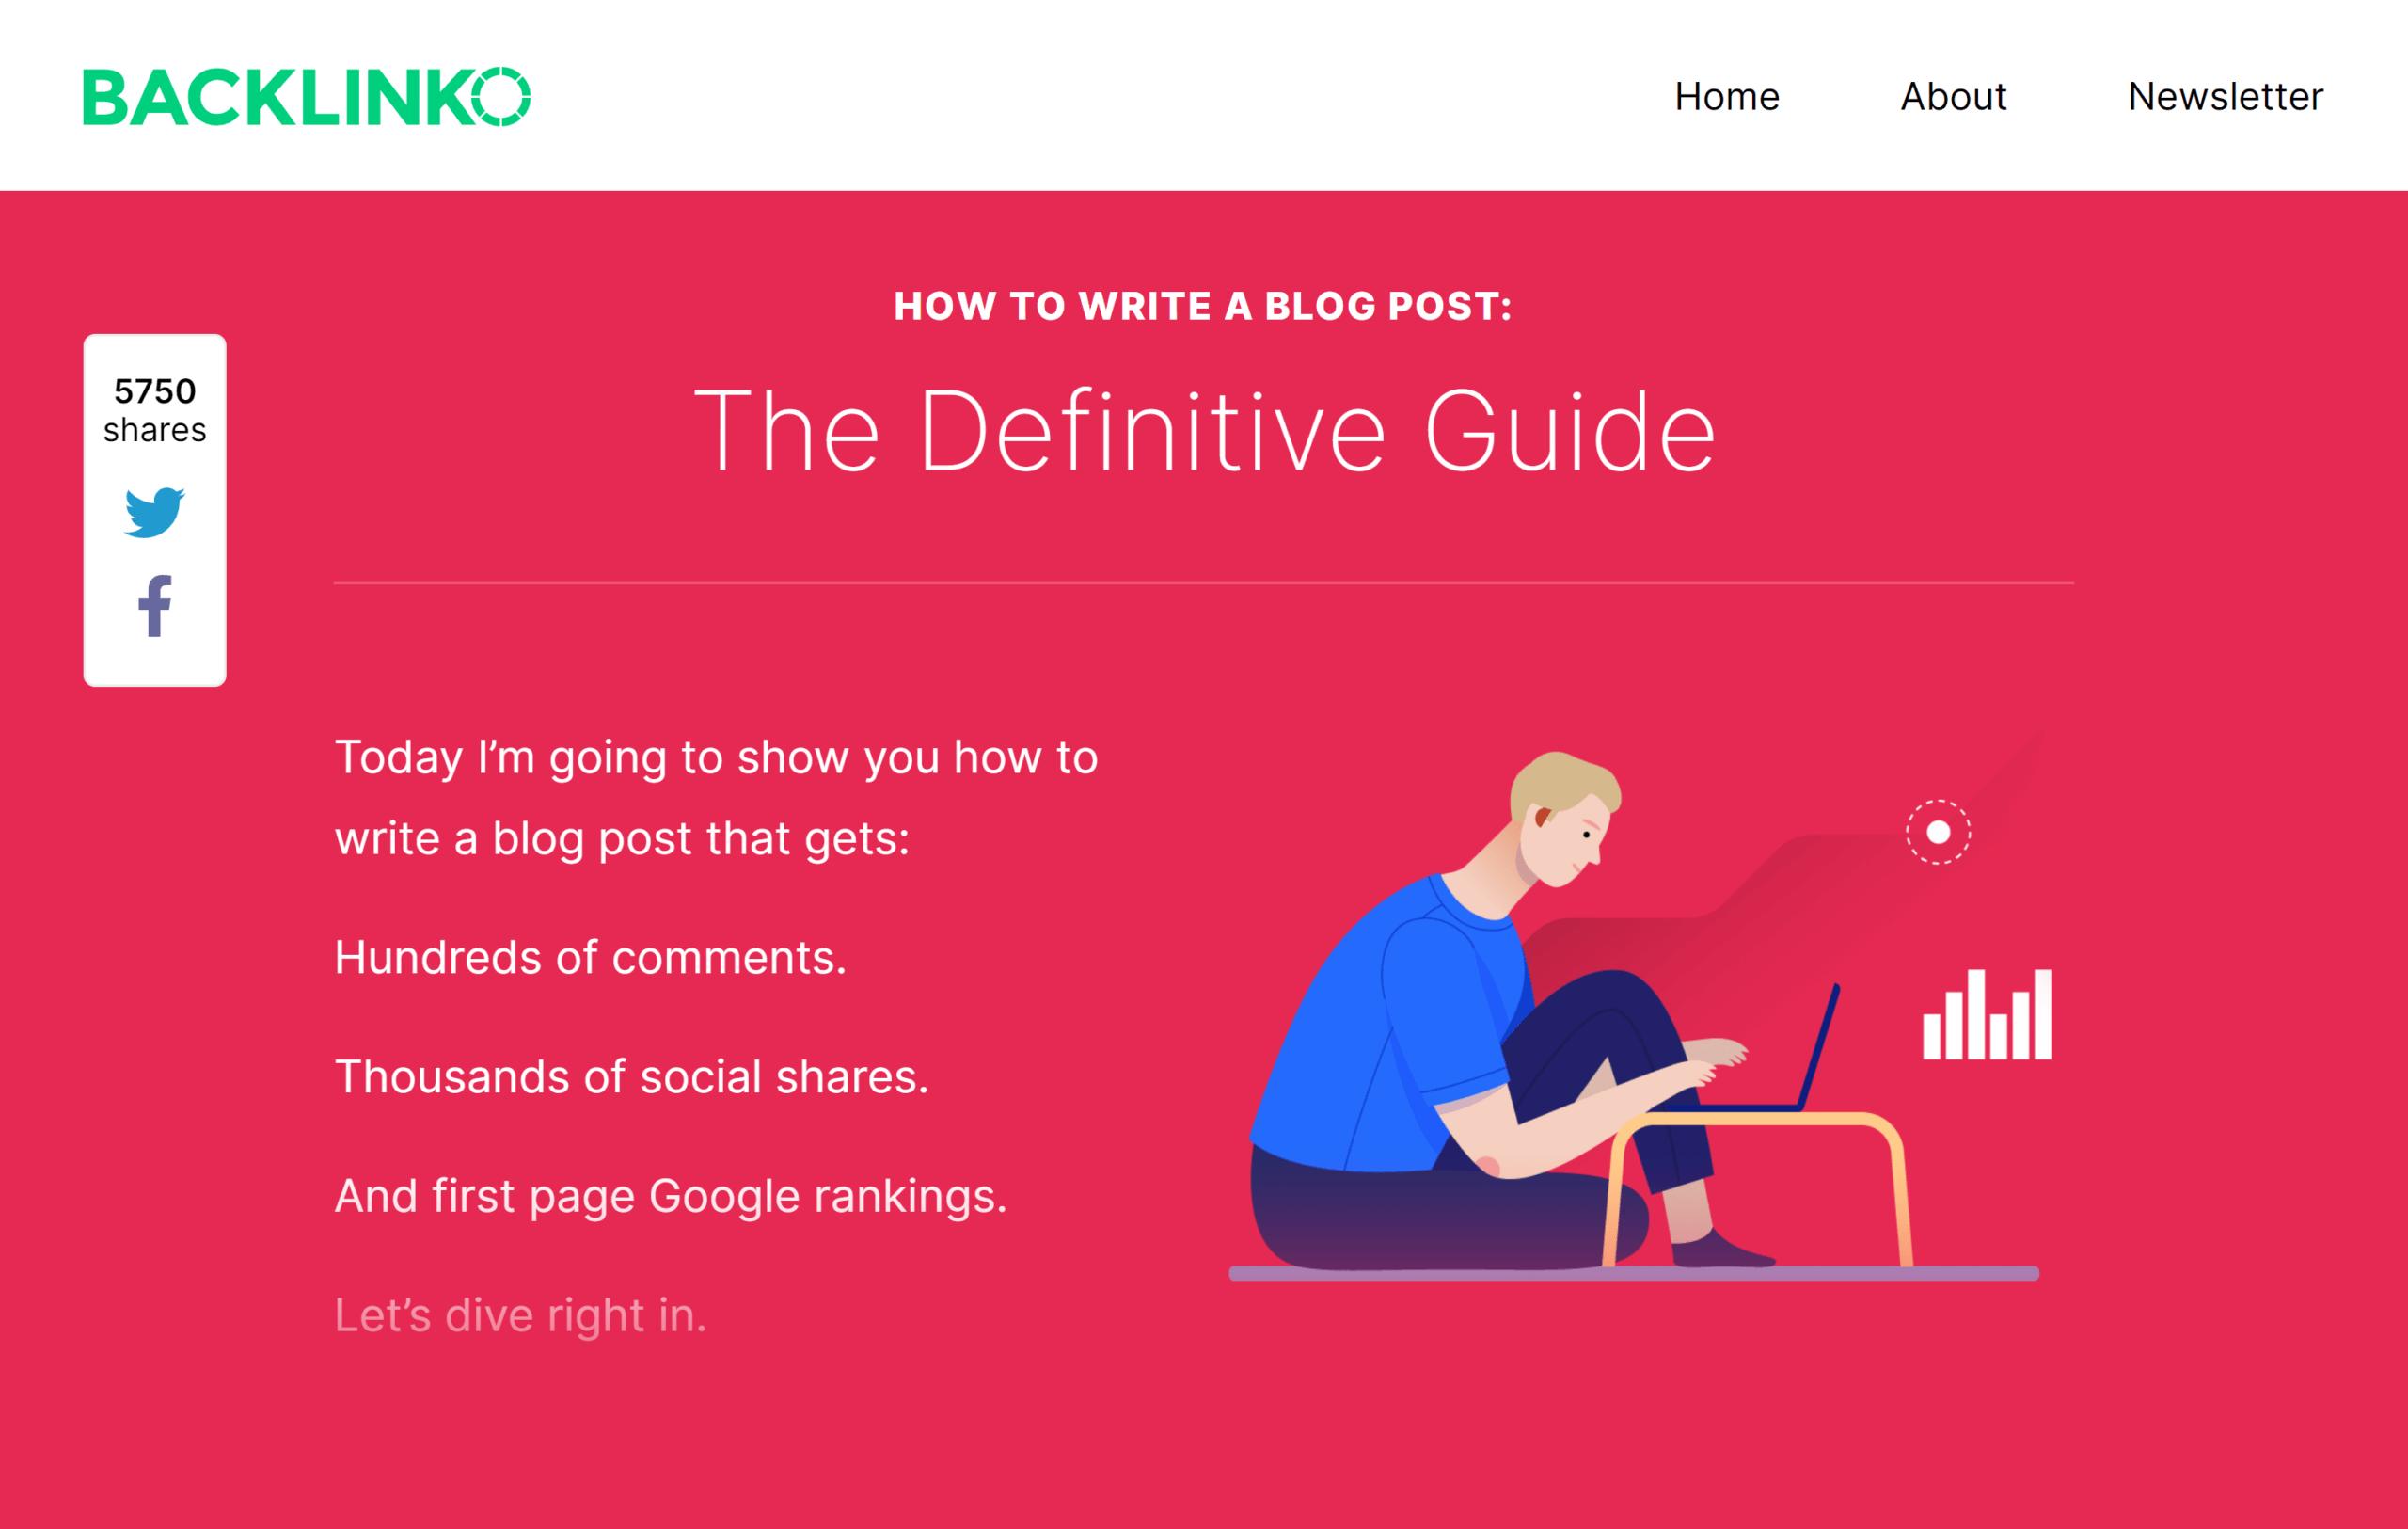 Backlinko – Write a blog post